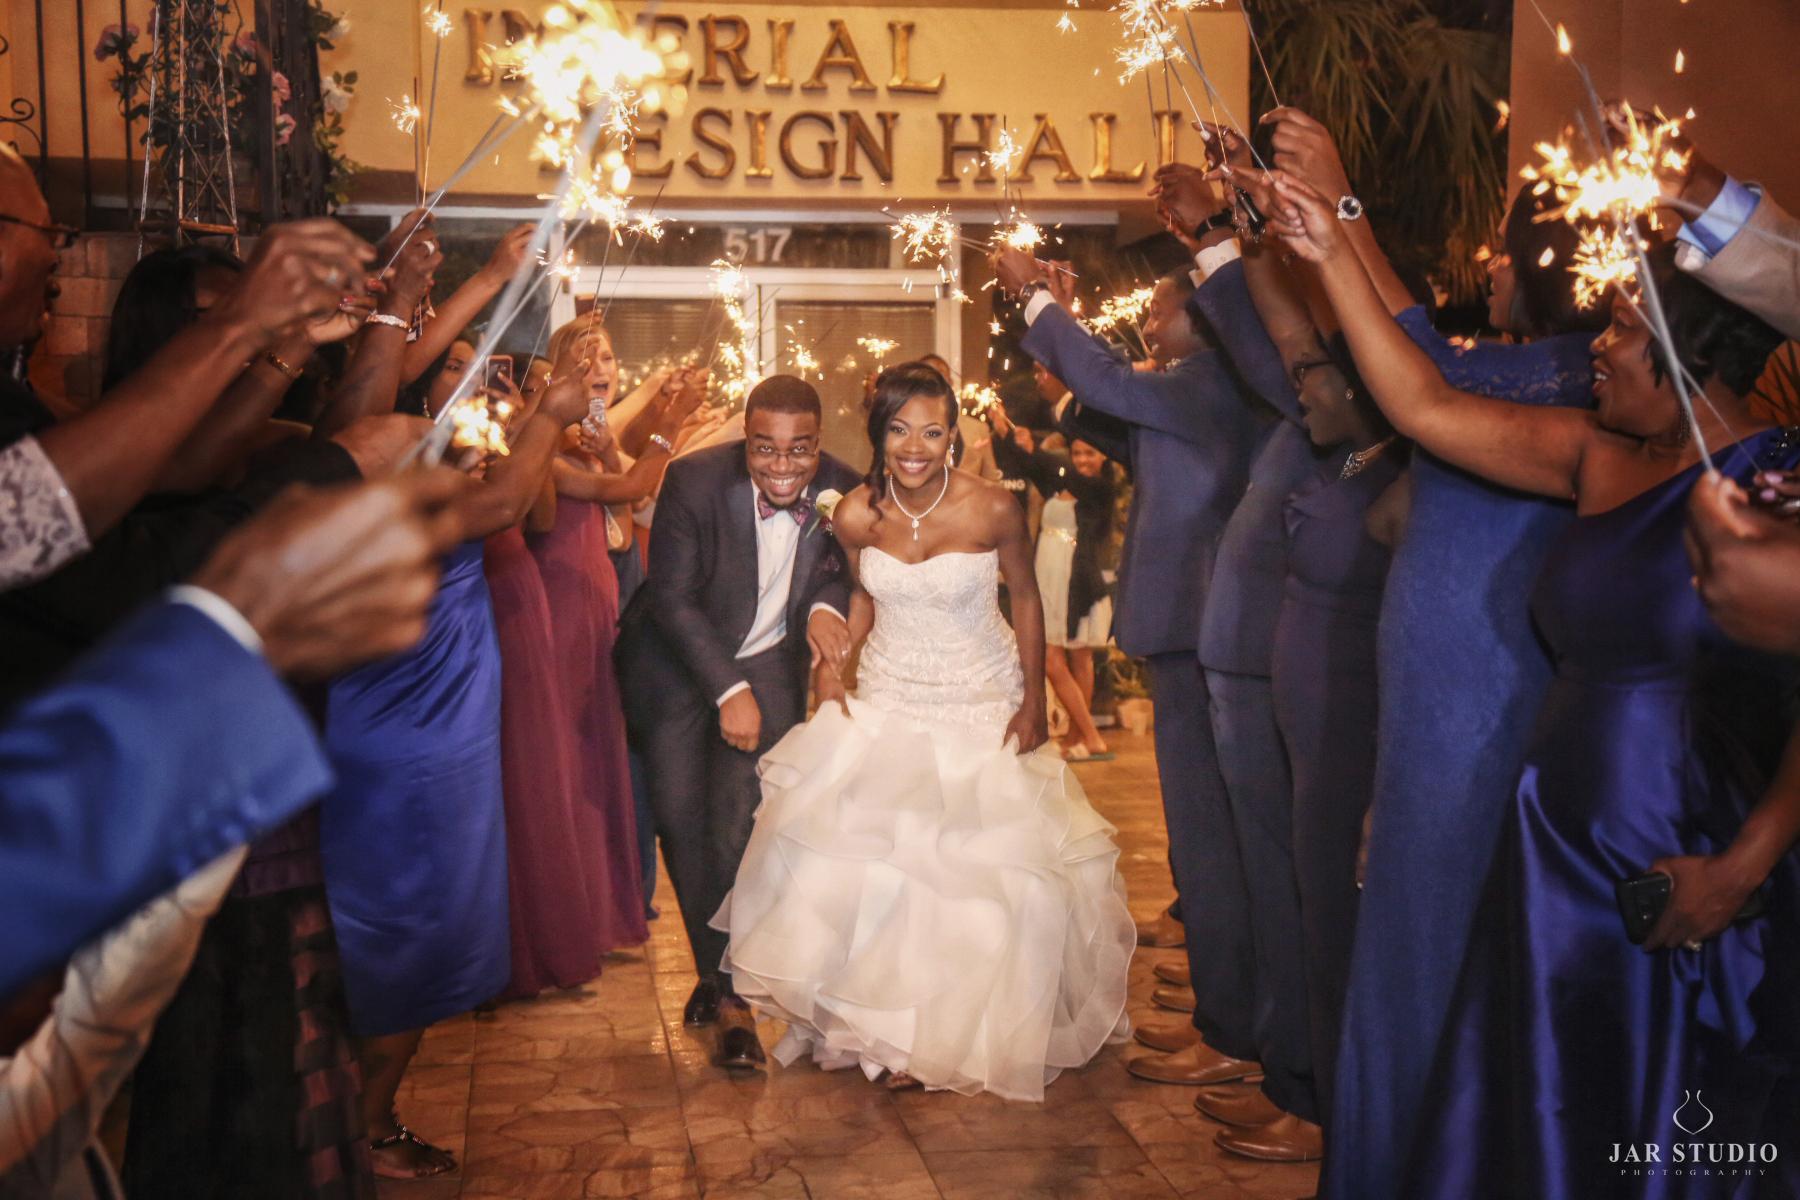 45-sparkles-send out- Imperial Design Hall - jarstudio-wedding-photographer.JPG